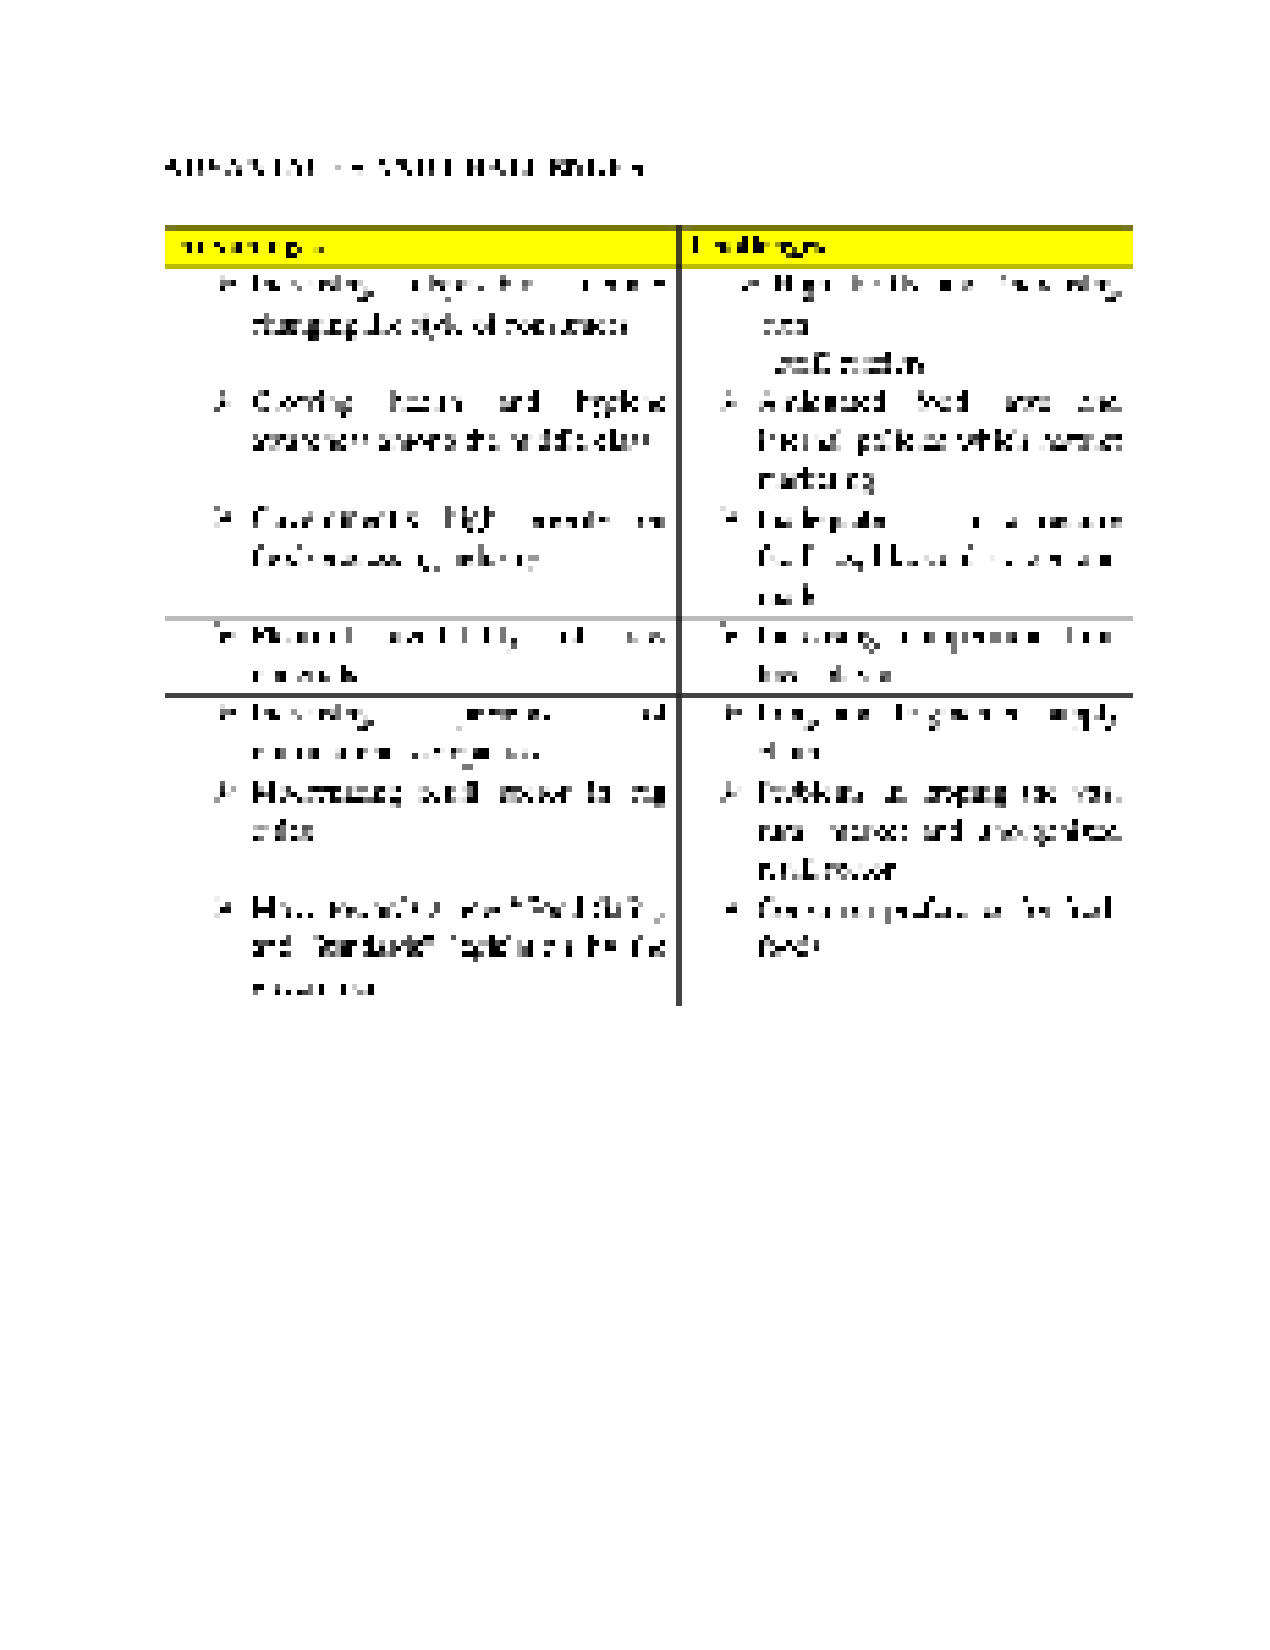 inventory management of britannia industries Britannia industries ltd  inventory 3,823 3,315 3,528 3,785  27 may 2013 / india equity research / britannia quarterly update management.